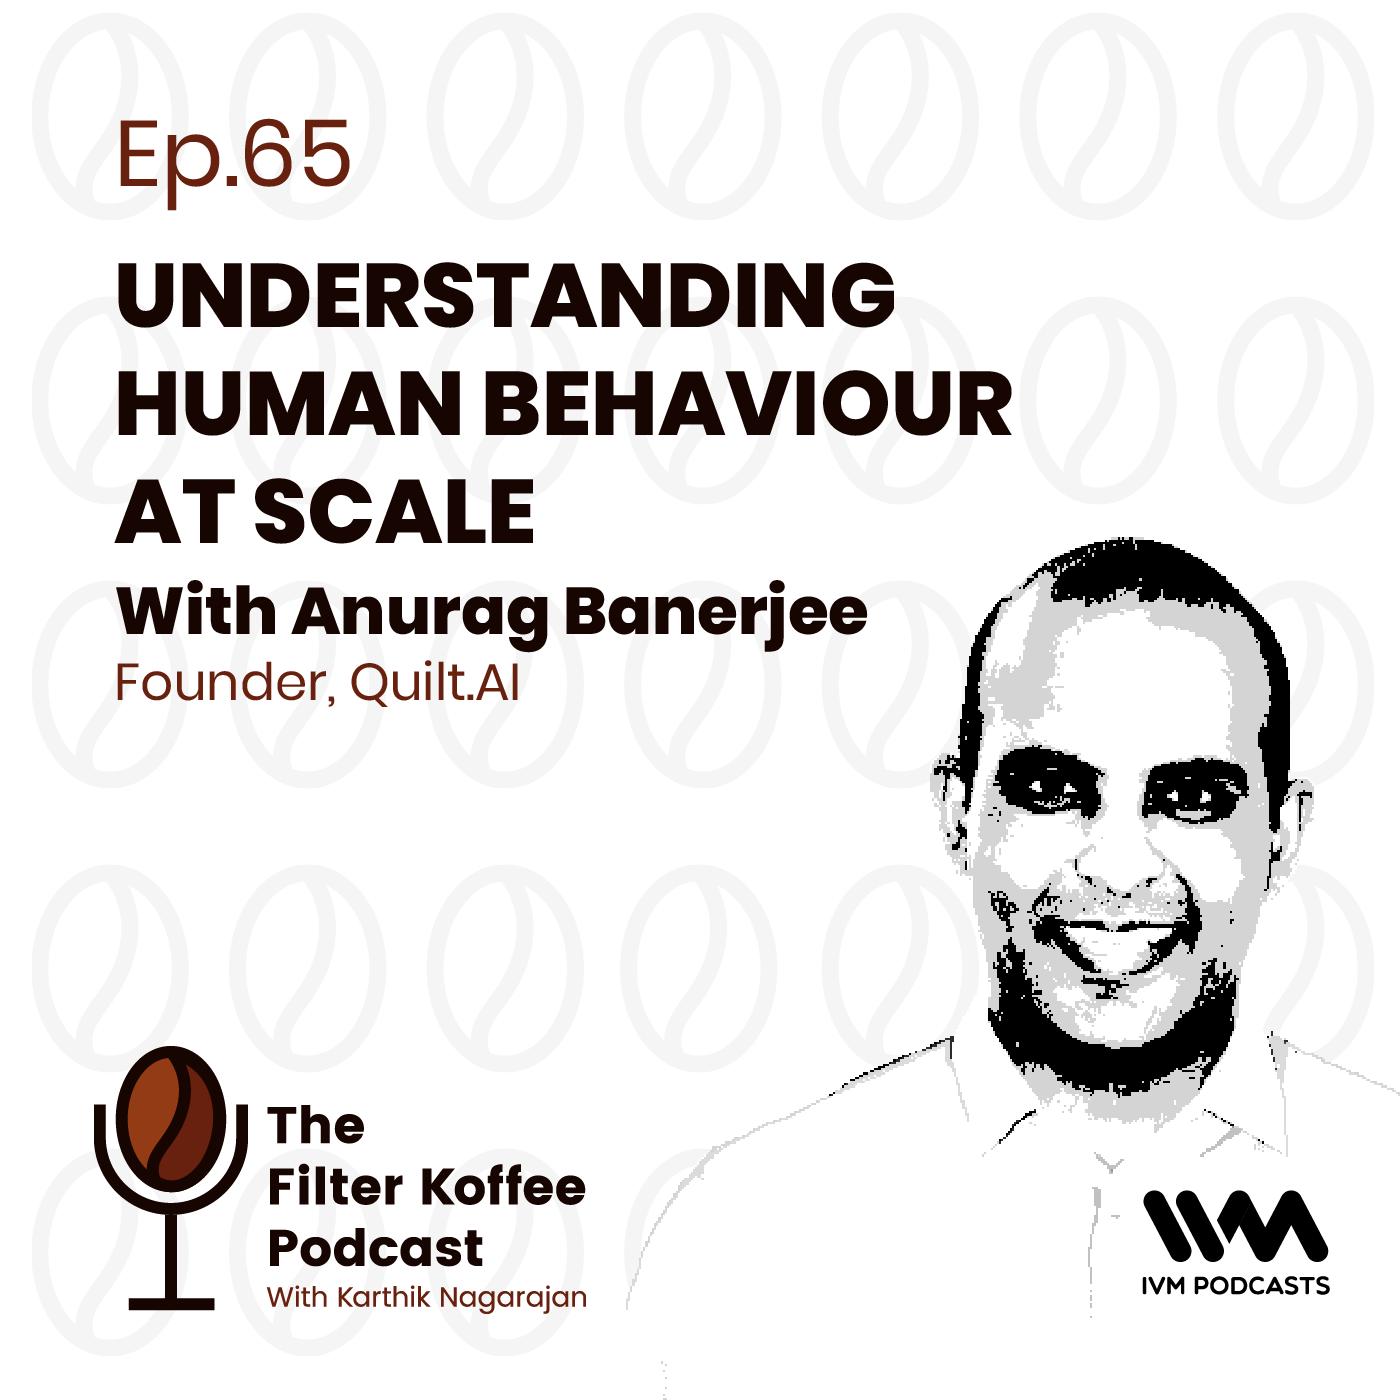 Ep. 65: Understanding Human Behaviour at Scale